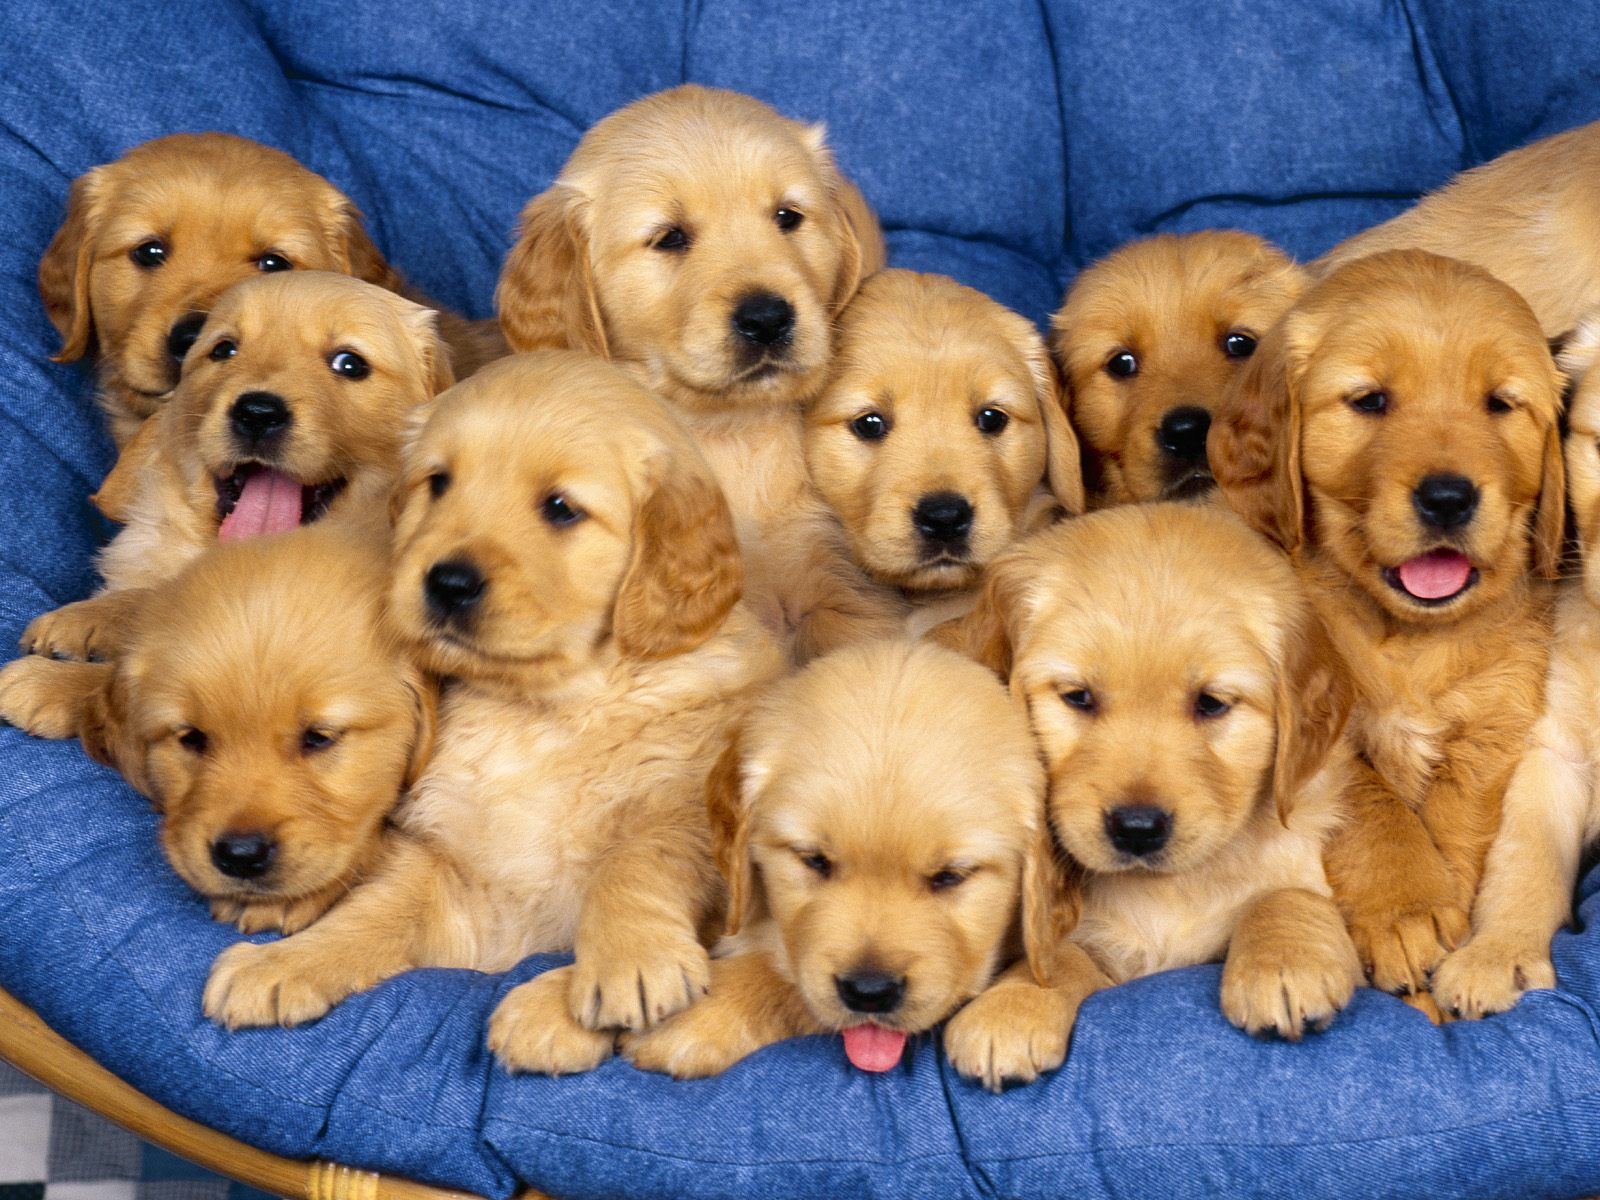 http://3.bp.blogspot.com/-QzVPuub-ZiA/TzU1INNbH5I/AAAAAAAAAtg/UJBB4e5avY4/s1600/dog-wallpapers-12.jpg